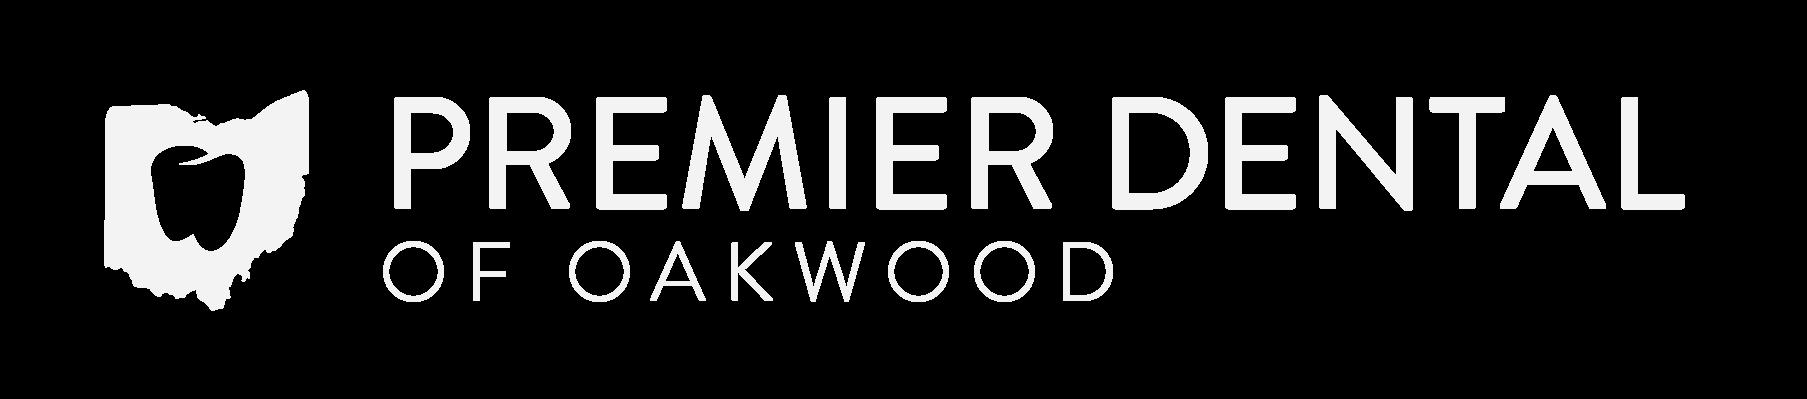 Premier Dental of Oakwood